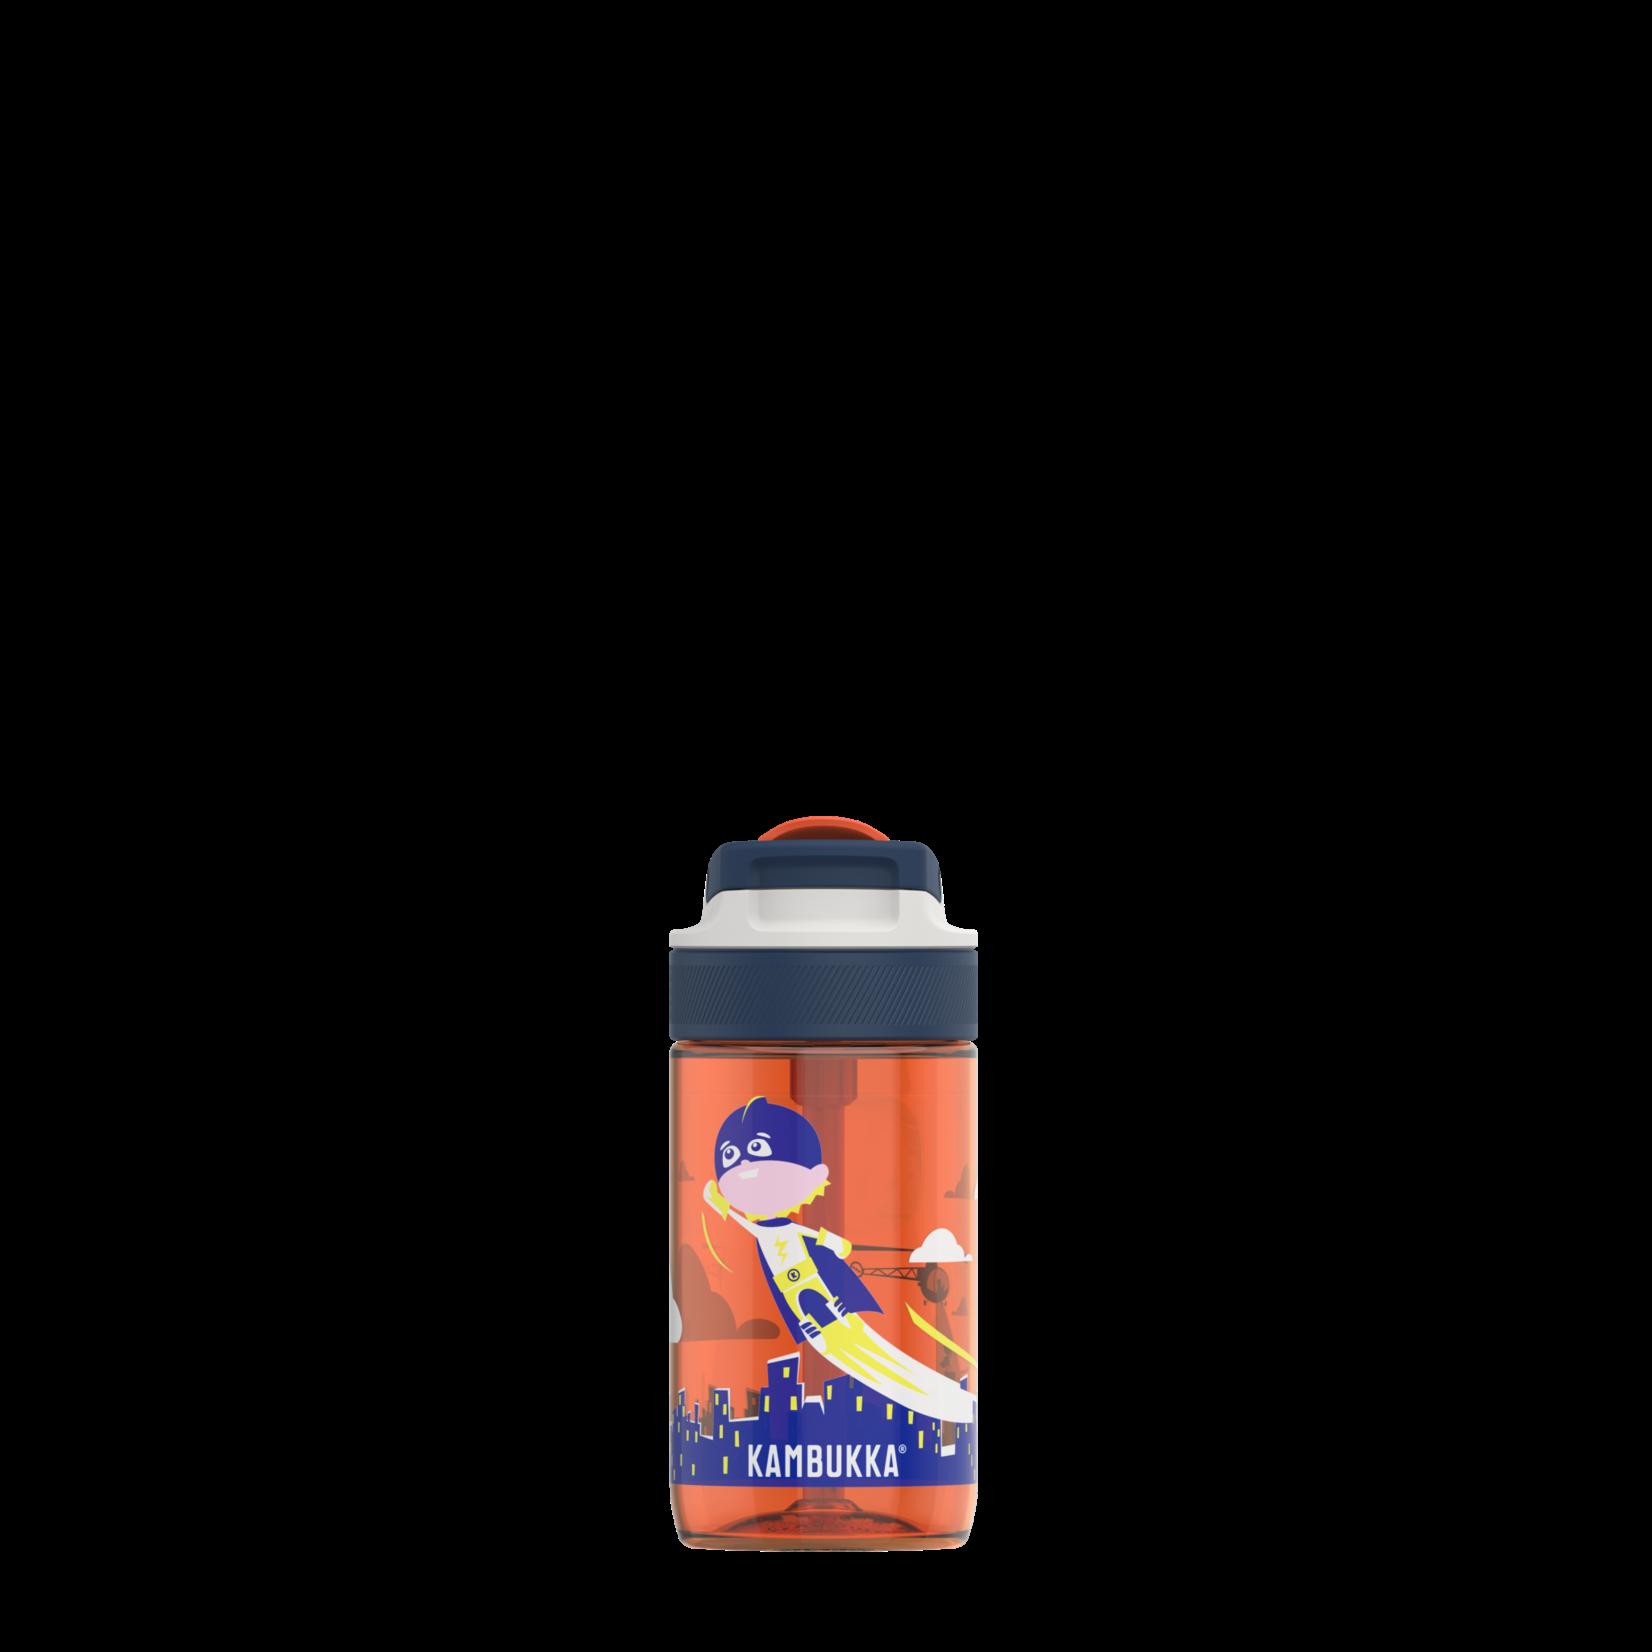 Kambukka Lagoon 500ml Flying Superboy